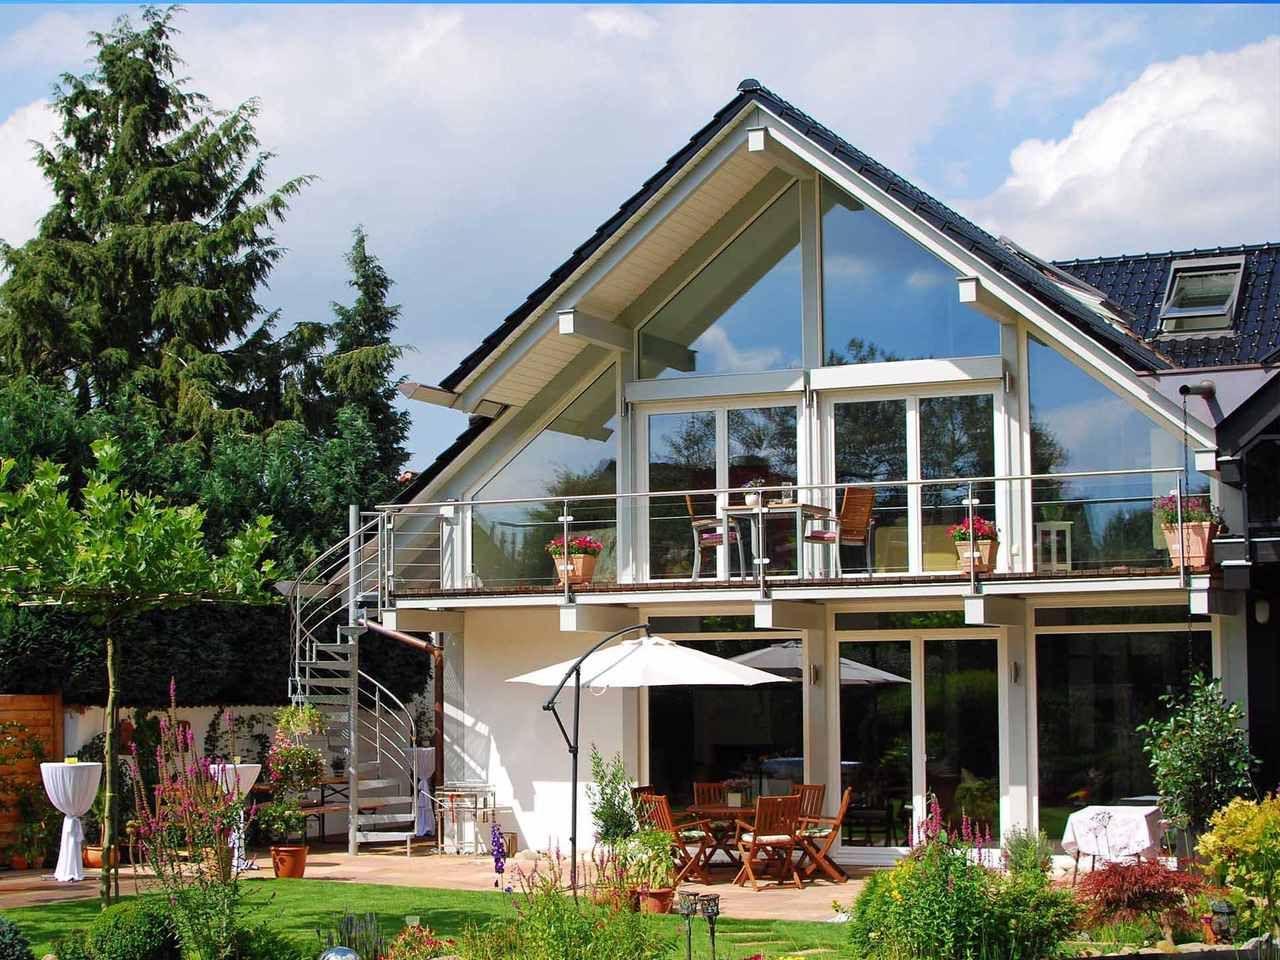 Musterhaus Kd Haus 250 Modernes Fachwerkhaus Fachwerkhauser Musterhaus Haus